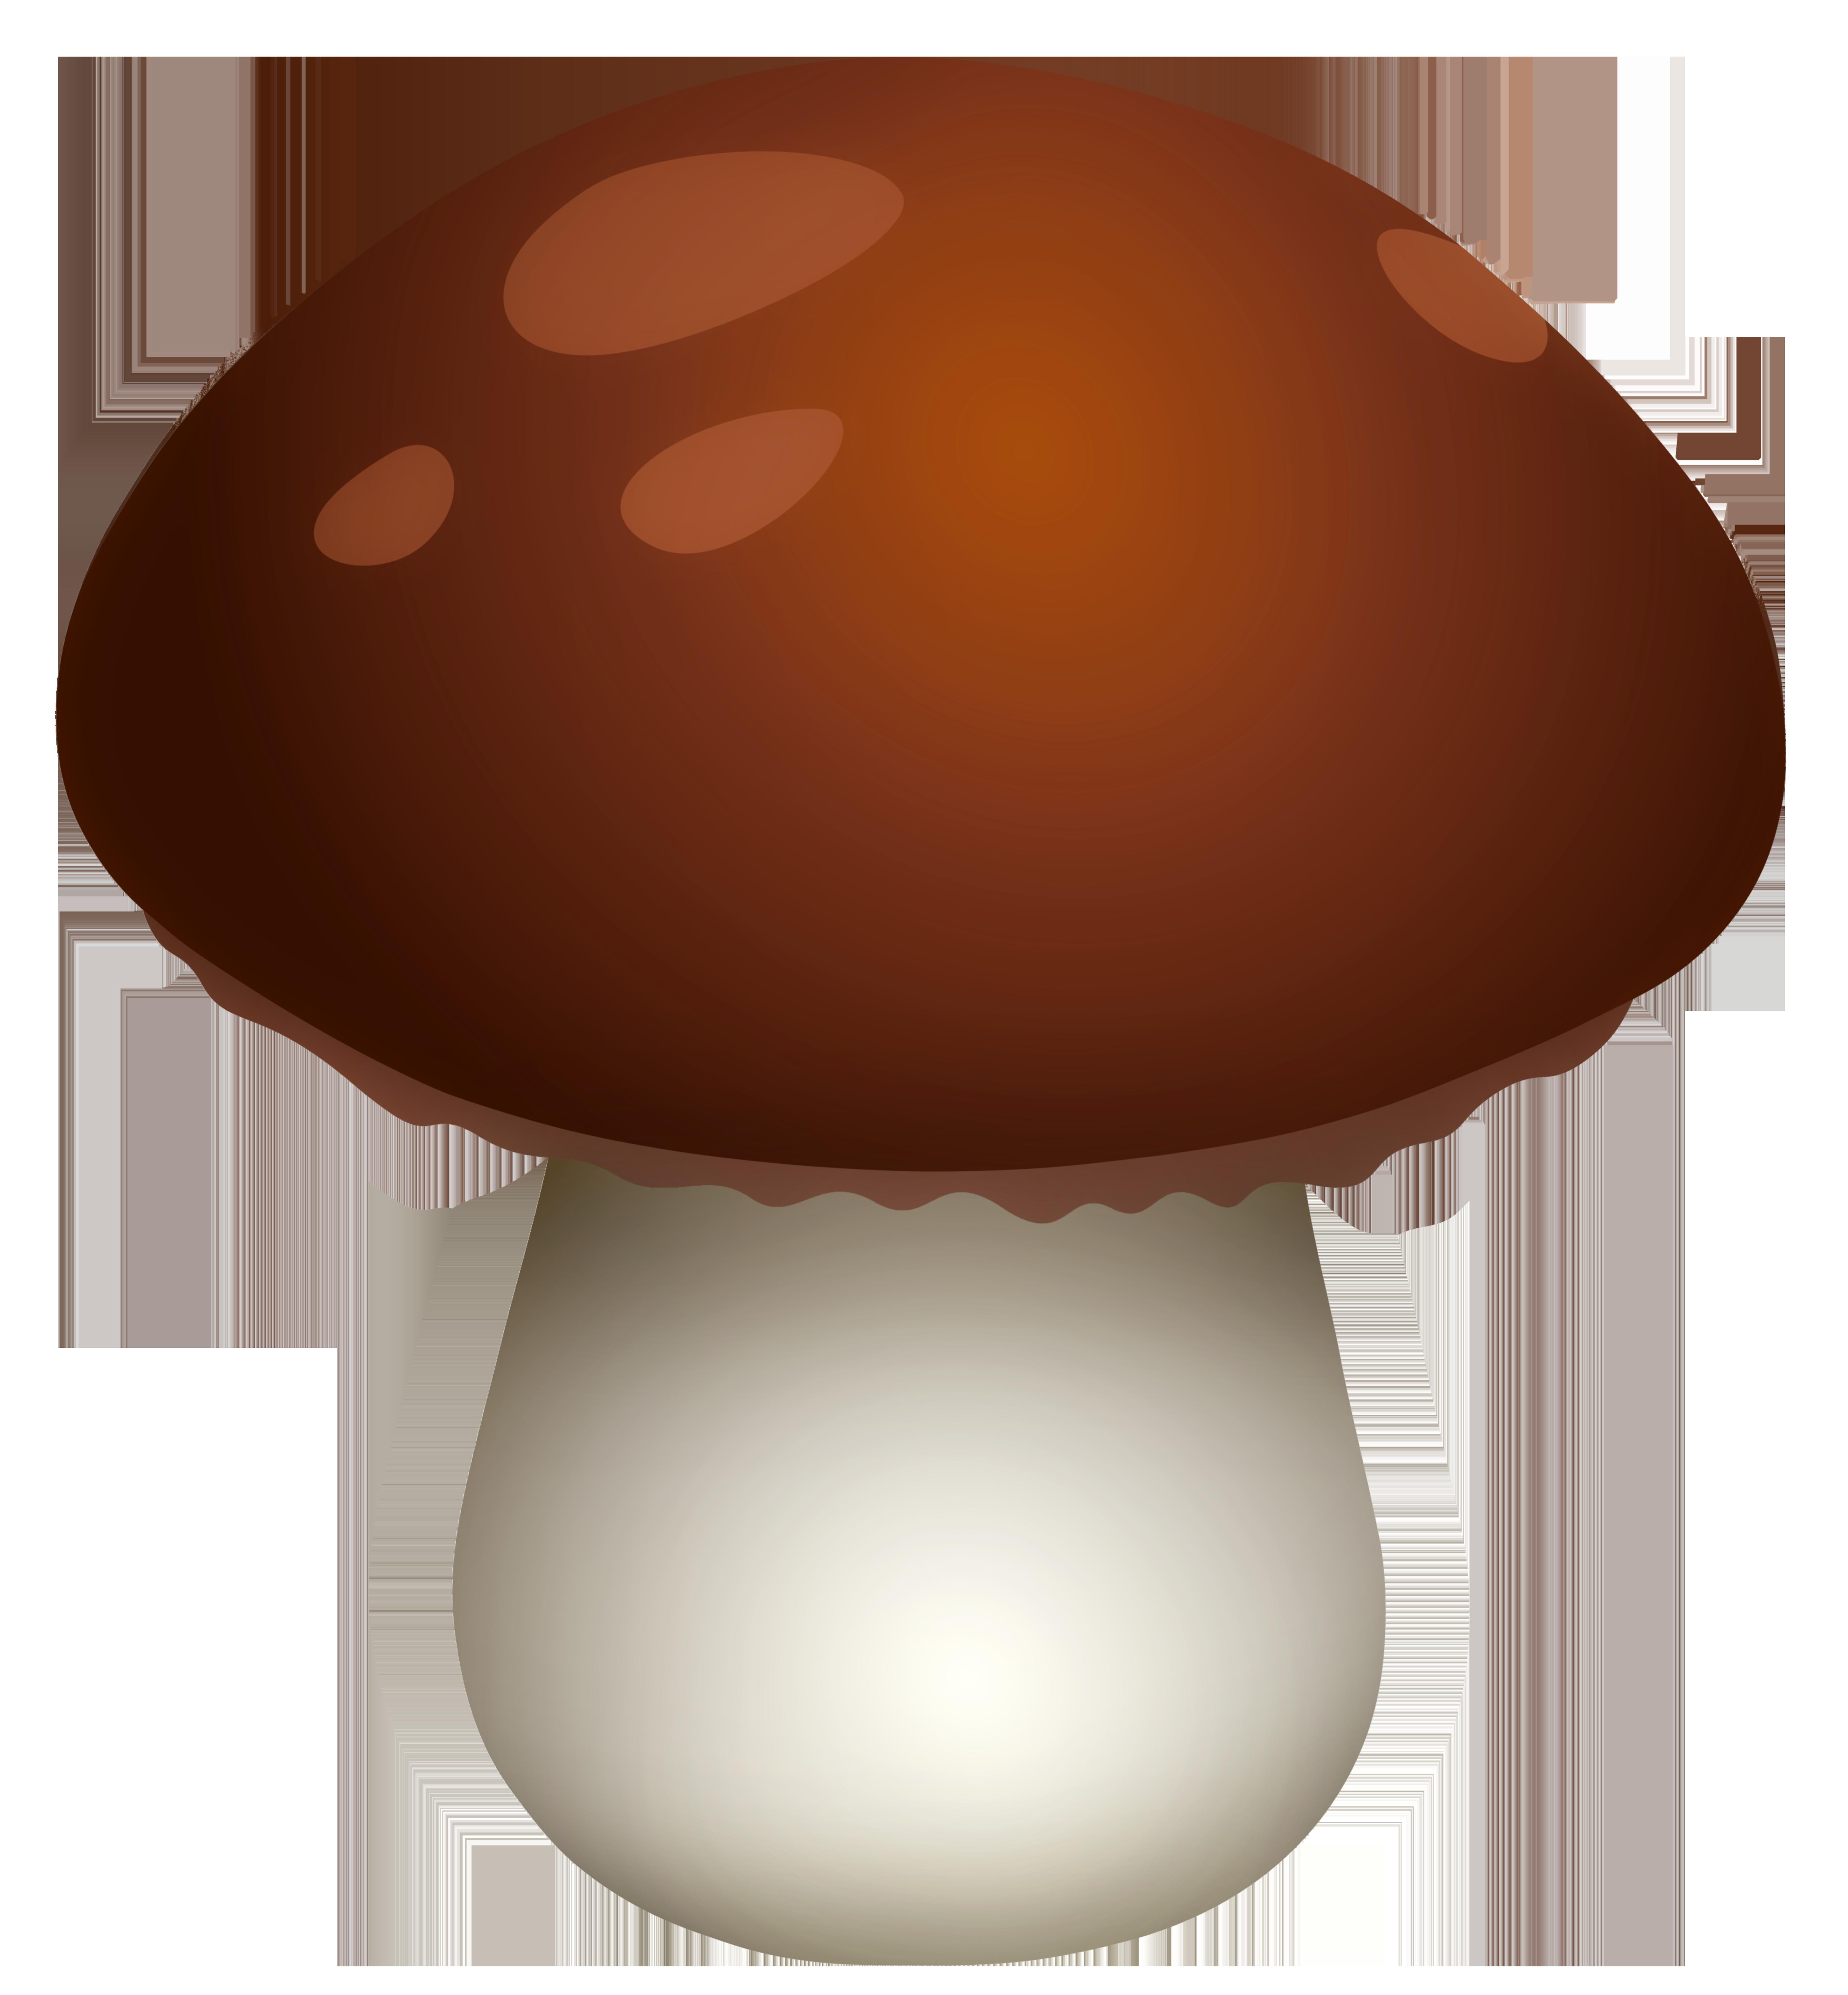 clip art freeuse library Dark brown mushroom png. Mushrooms clipart.